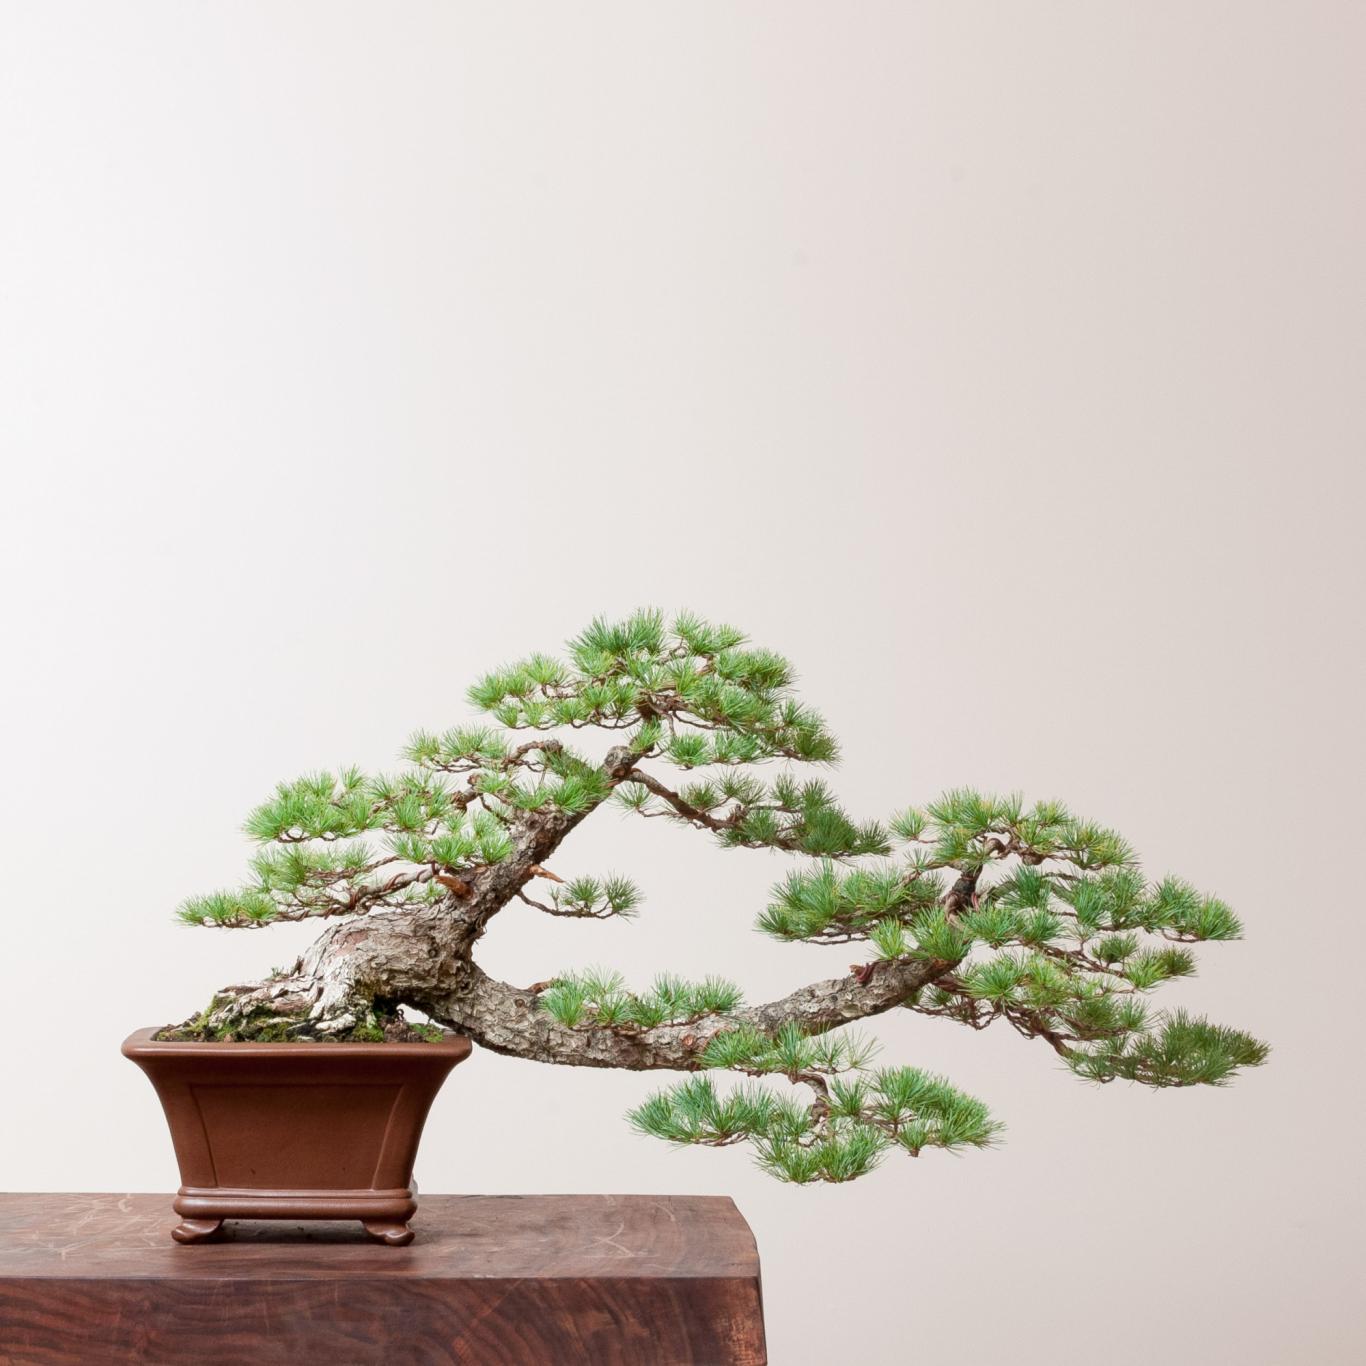 Japanese White Pine No 2 Bonsai Mirai